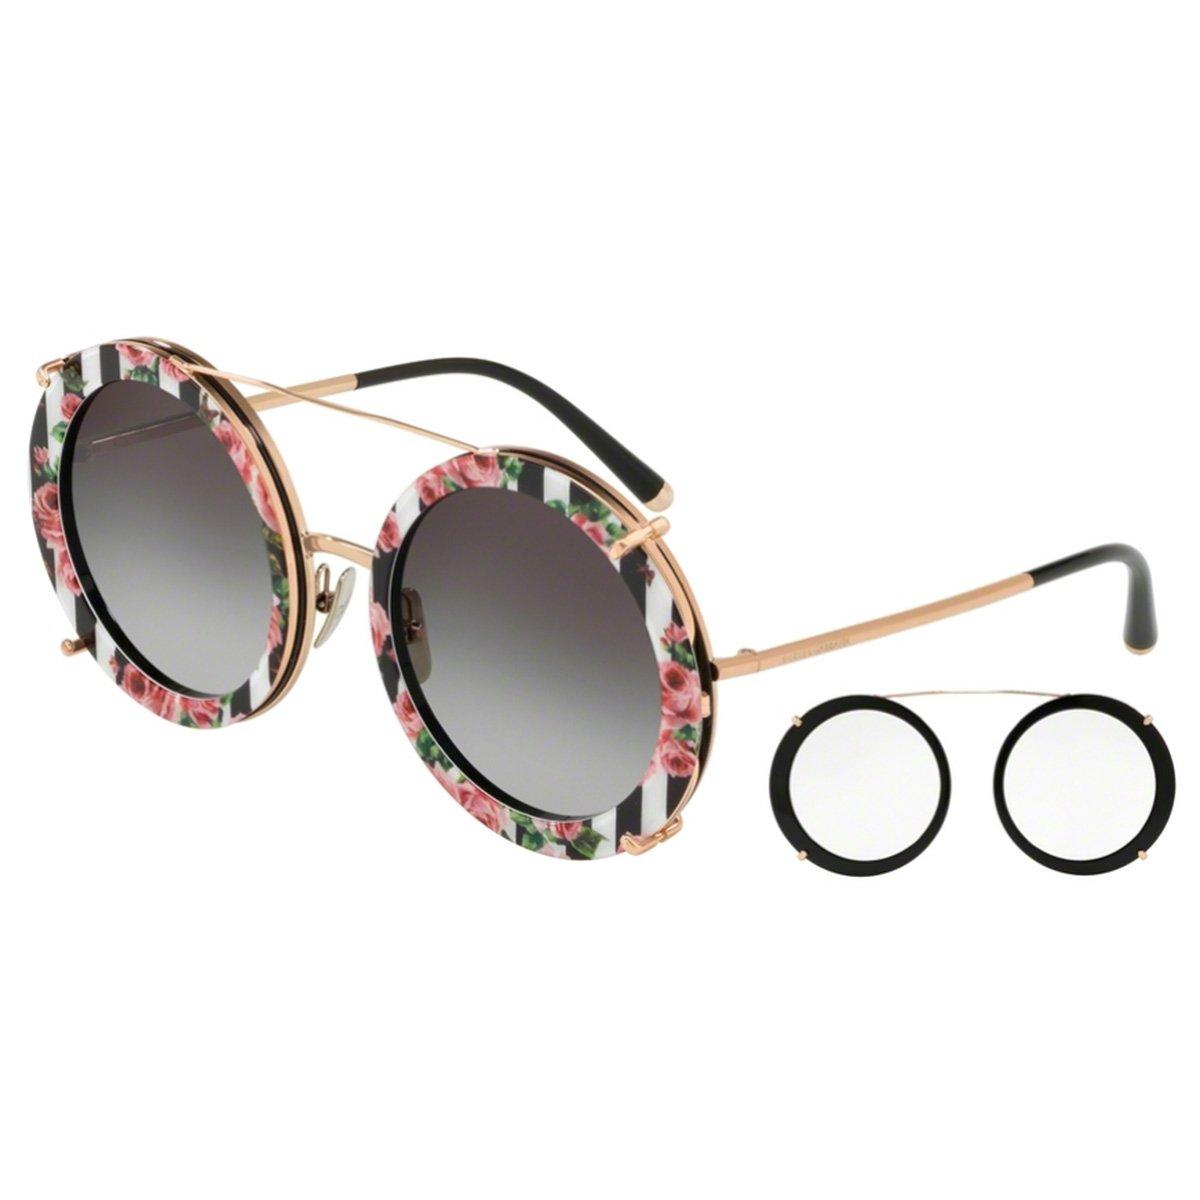 15f6b6c0b Compre Óculos de Sol Dolce & Gabbana em 10X | Tri-Jóia Shop